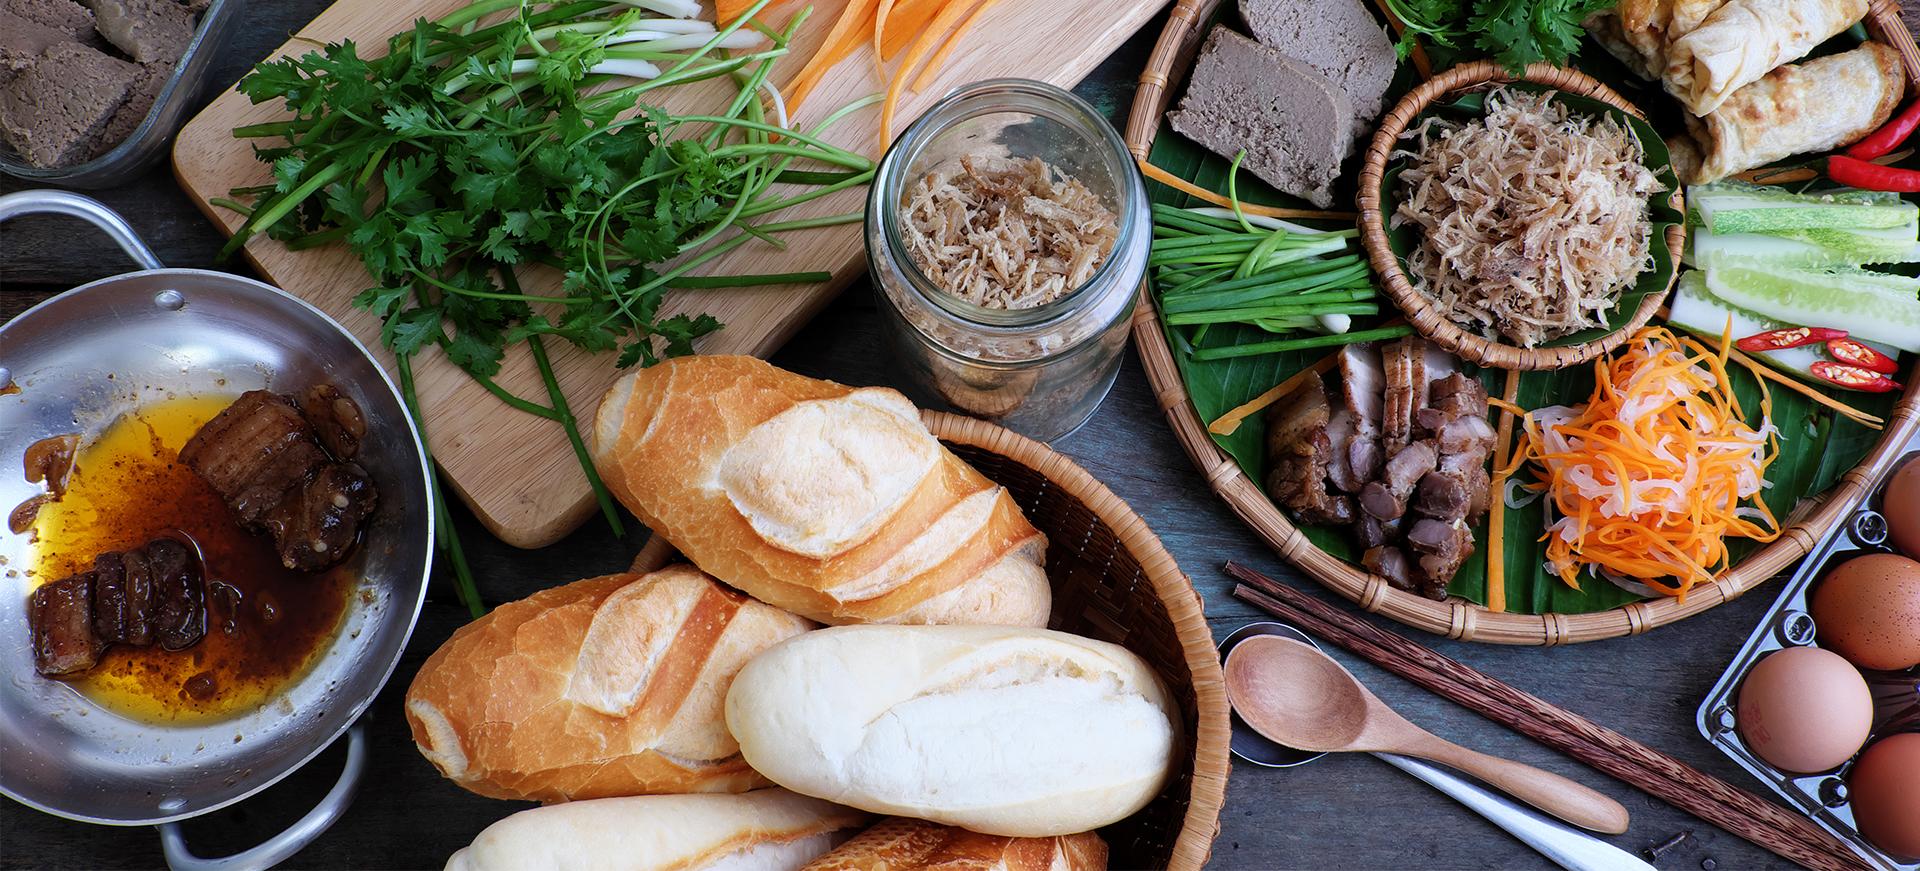 Culinary-Adventure-Thumb-Resize-H.jpg